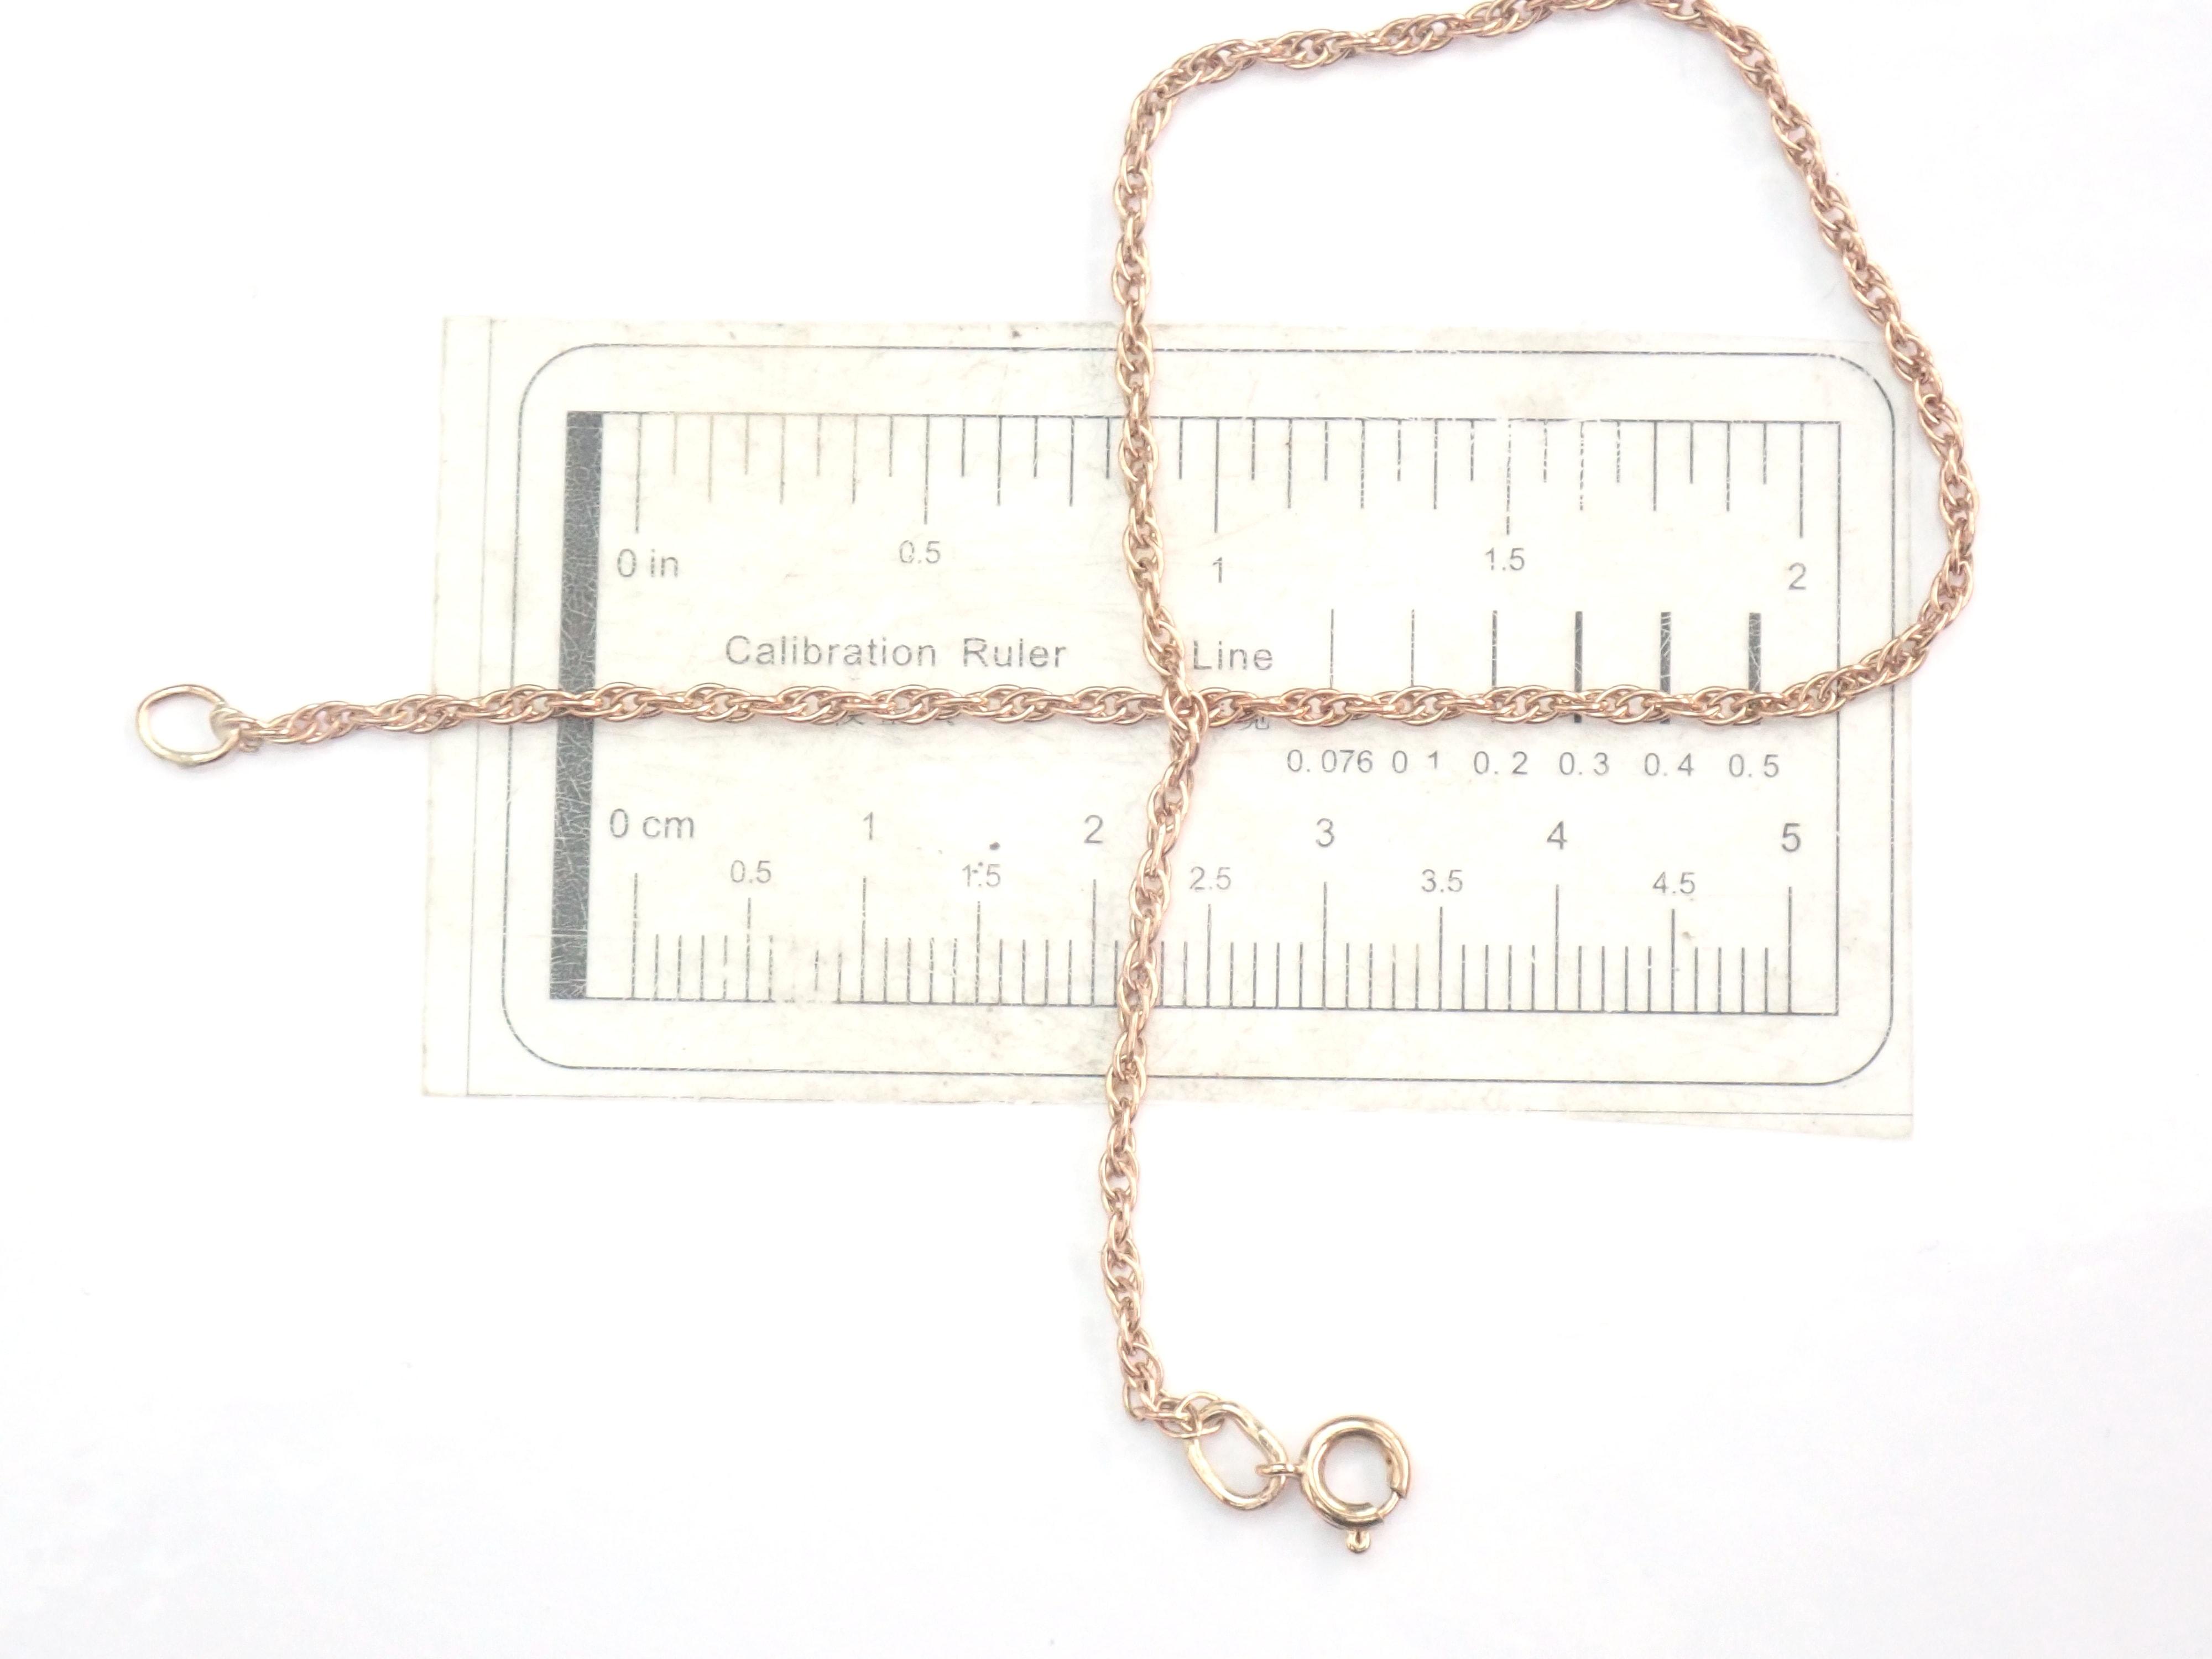 9k Rose Gold Prince of Wales linked Chain Bracelet 8″ – 1.6gms #20